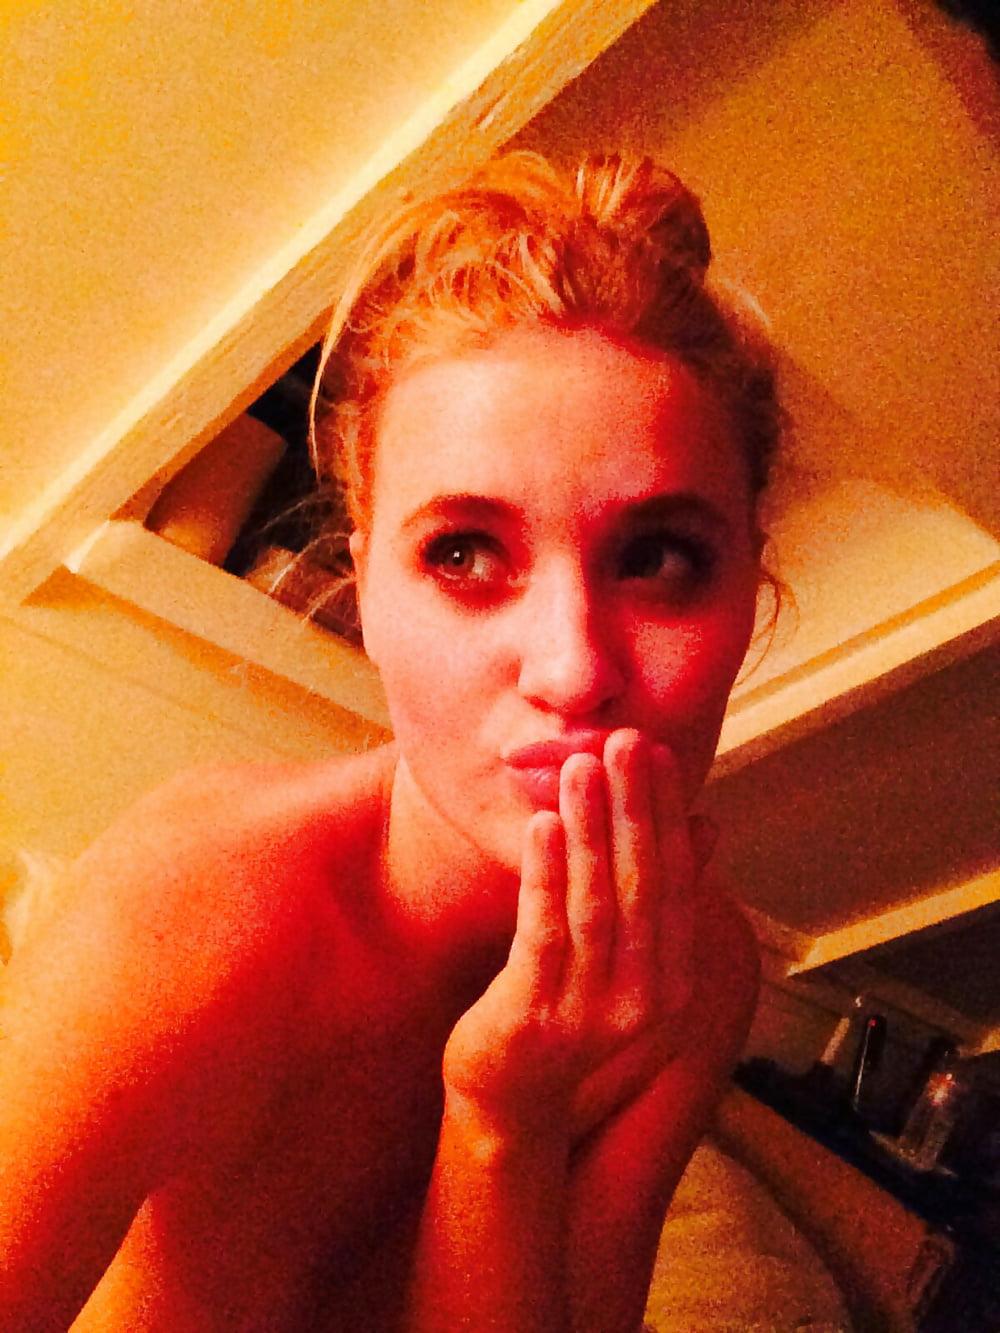 Amanda Michalka Sex amanda joy aj michalka leaked photo's - 16 pics - xhamster